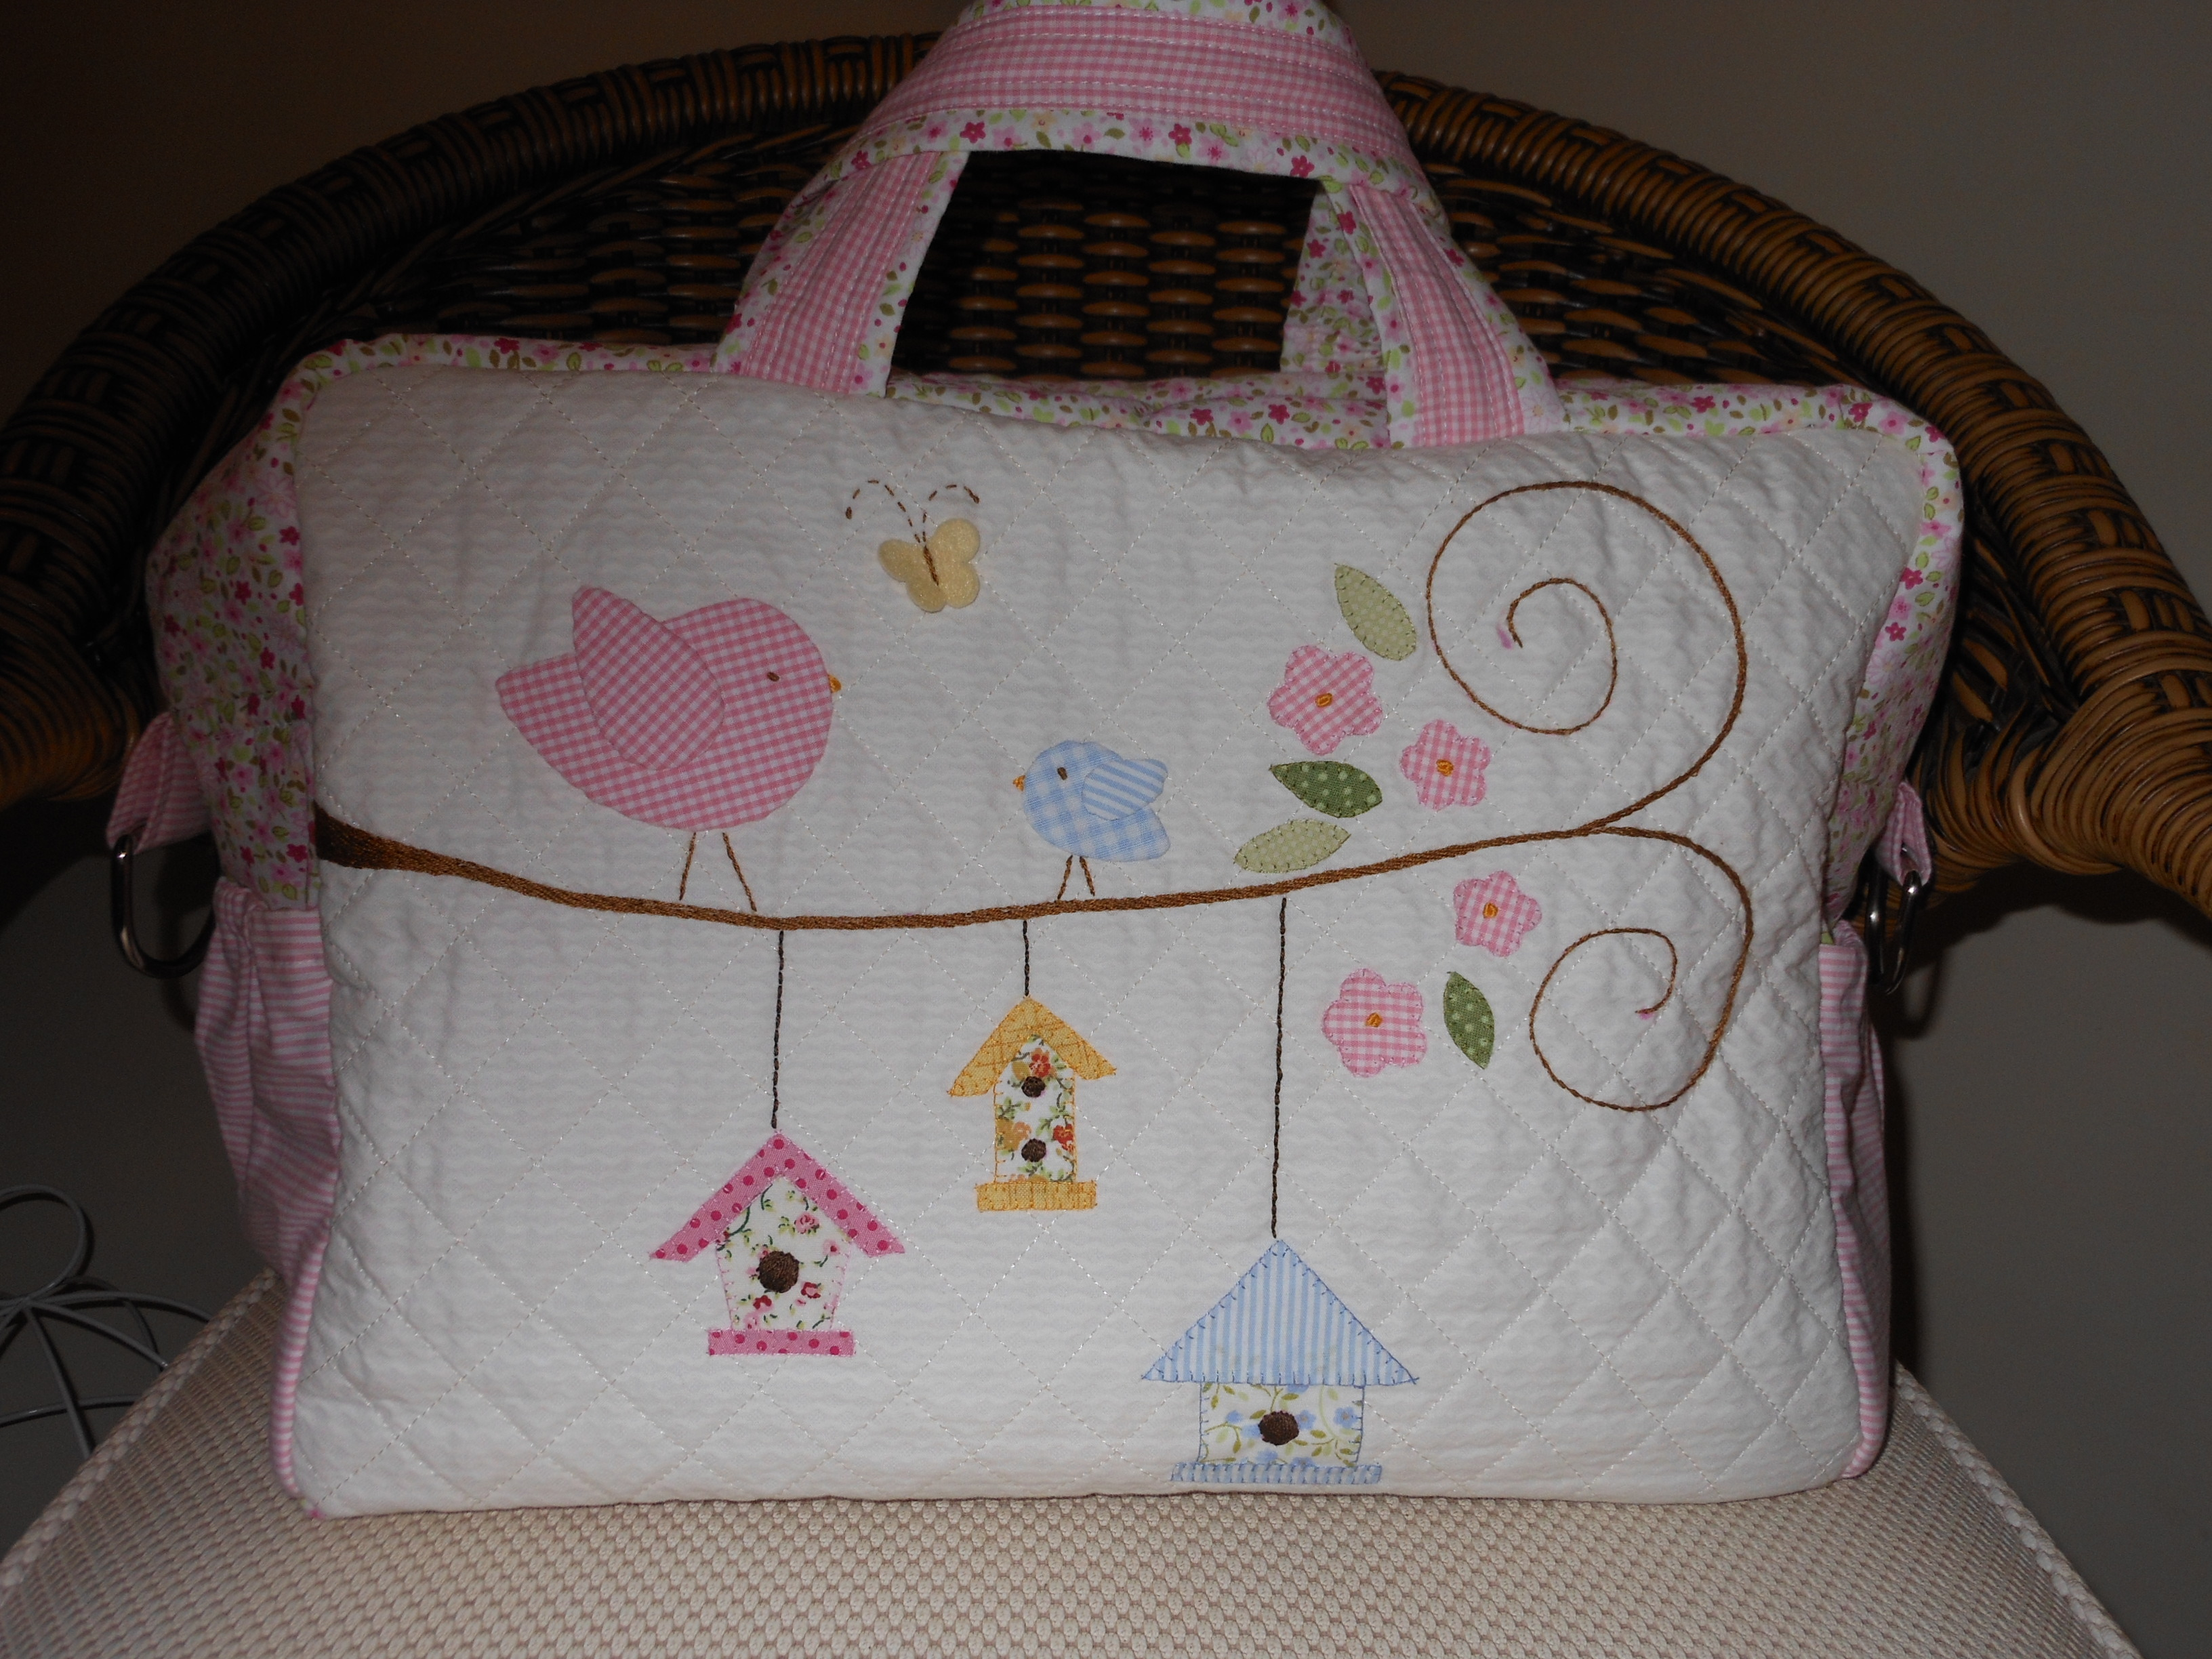 Bolsa De Tecido Bebe : Bolsa para beb? katze patchwork elo